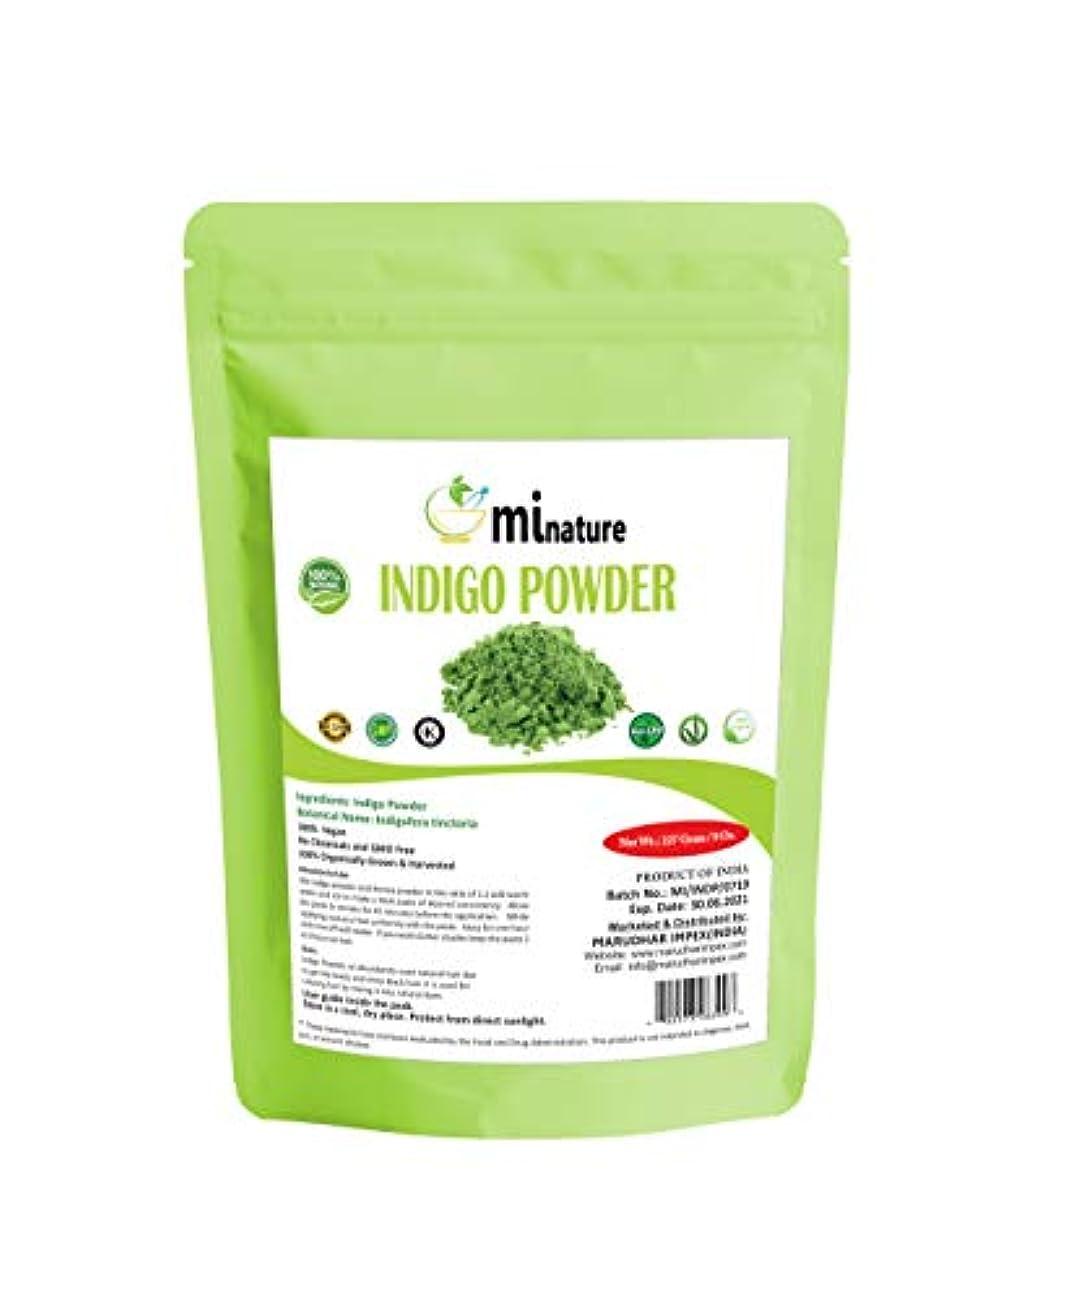 拡張先生加害者mi nature Indigo Powder -INDIGOFERA TINCTORIA ,(100% NATURAL , ORGANICALLY GROWN ) 1/2 LB (227 grams) RESEALABLE...